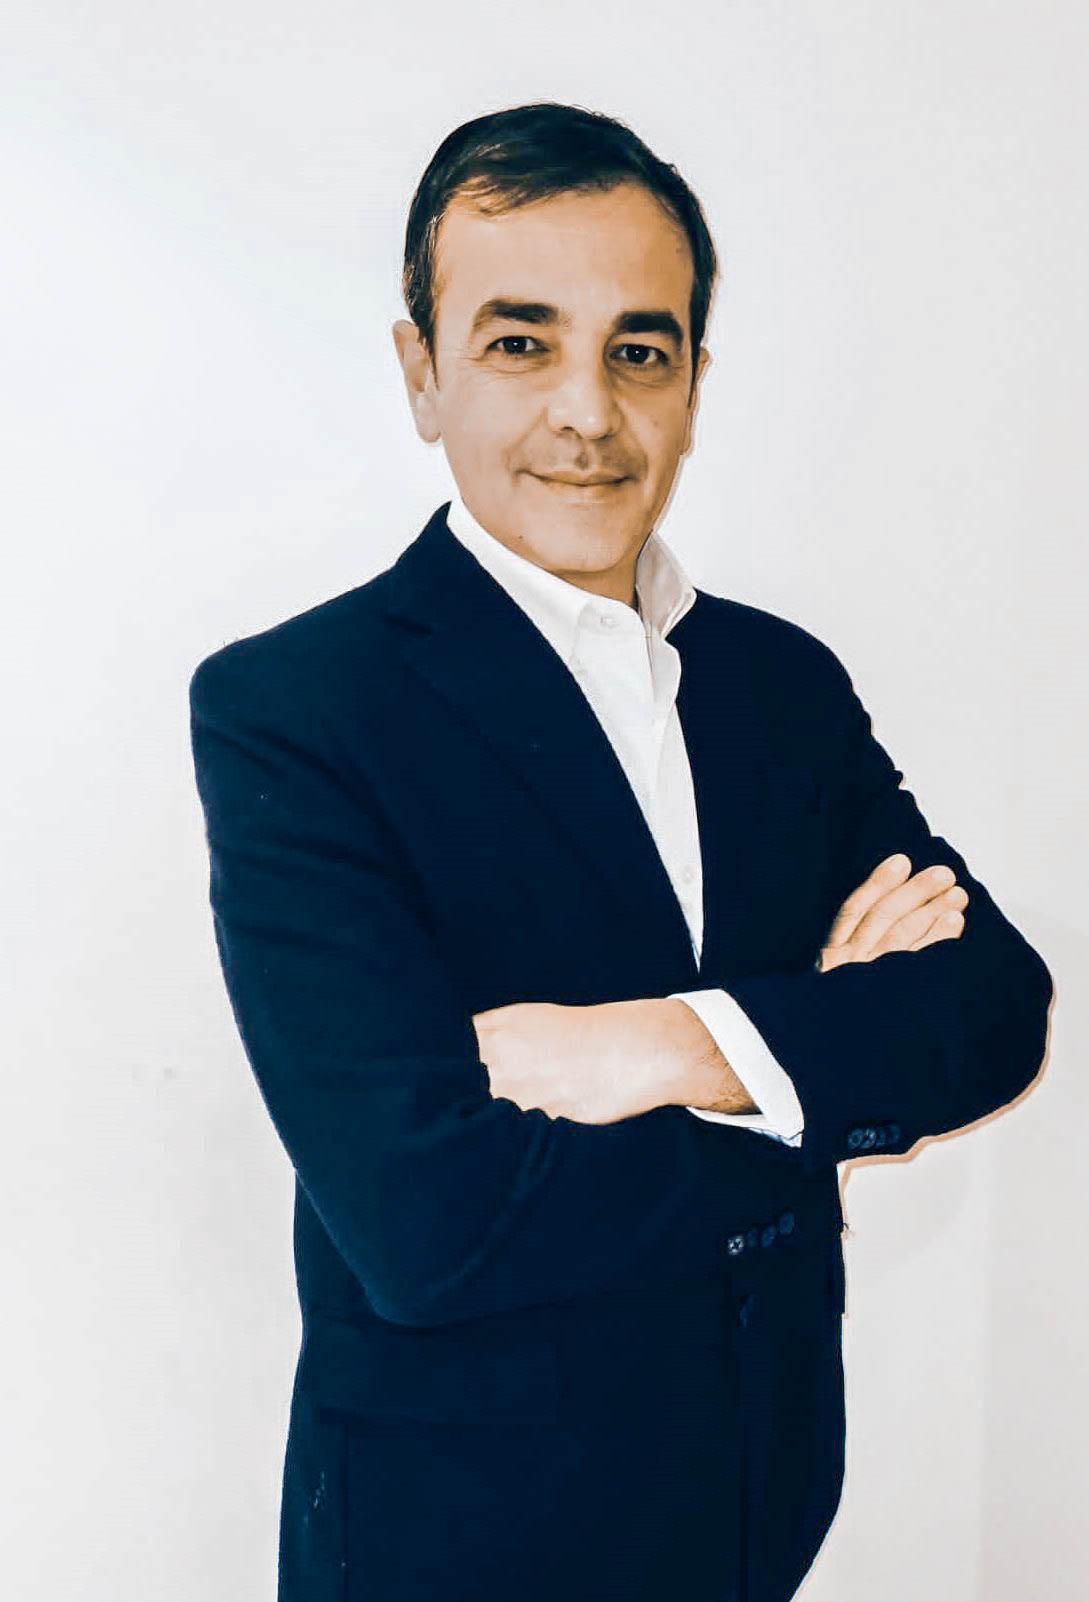 Miguel Ángel Hervás Company